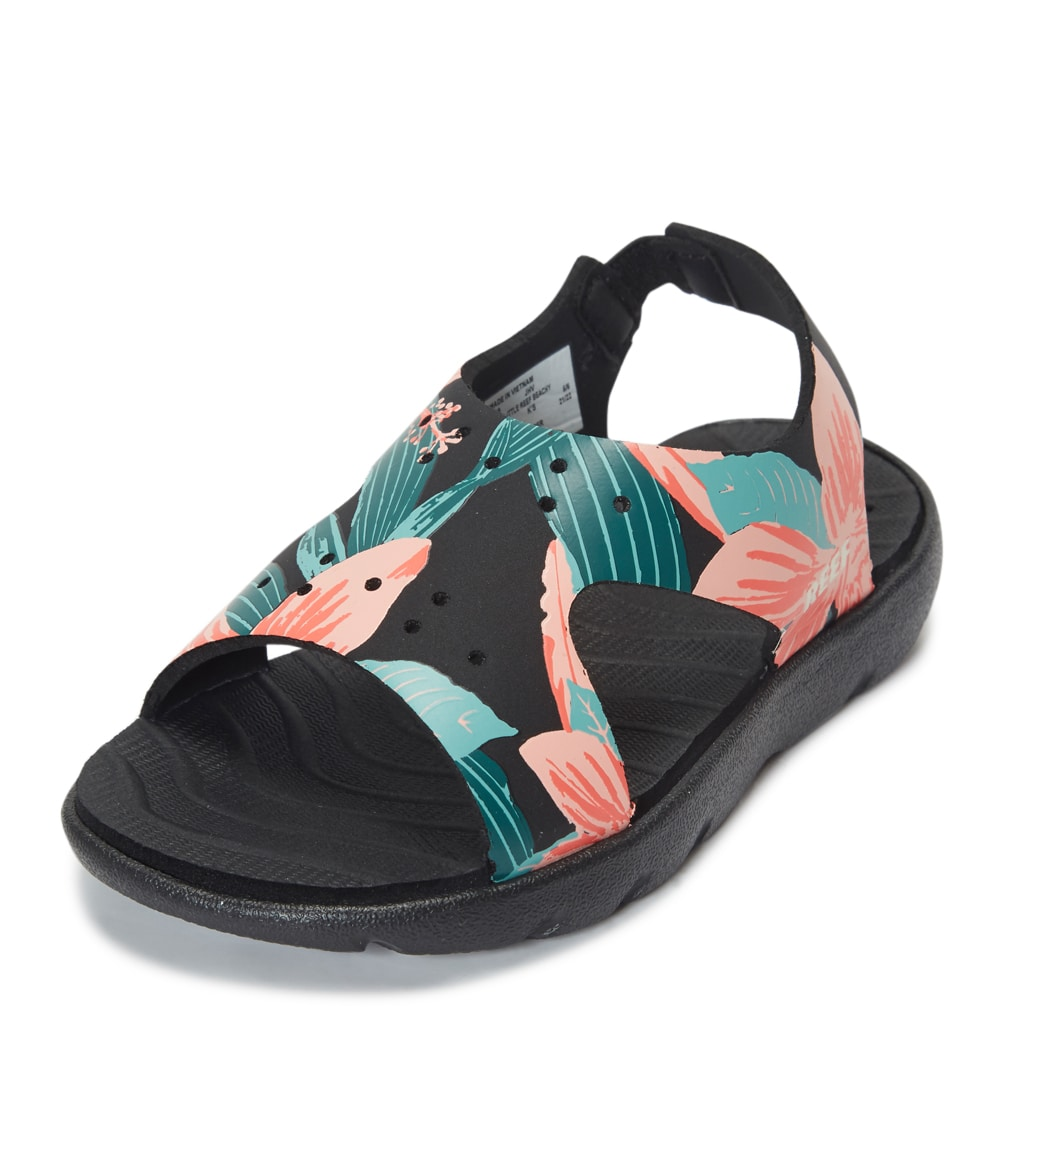 Reef Girls' Little Reef Beachy Sandal